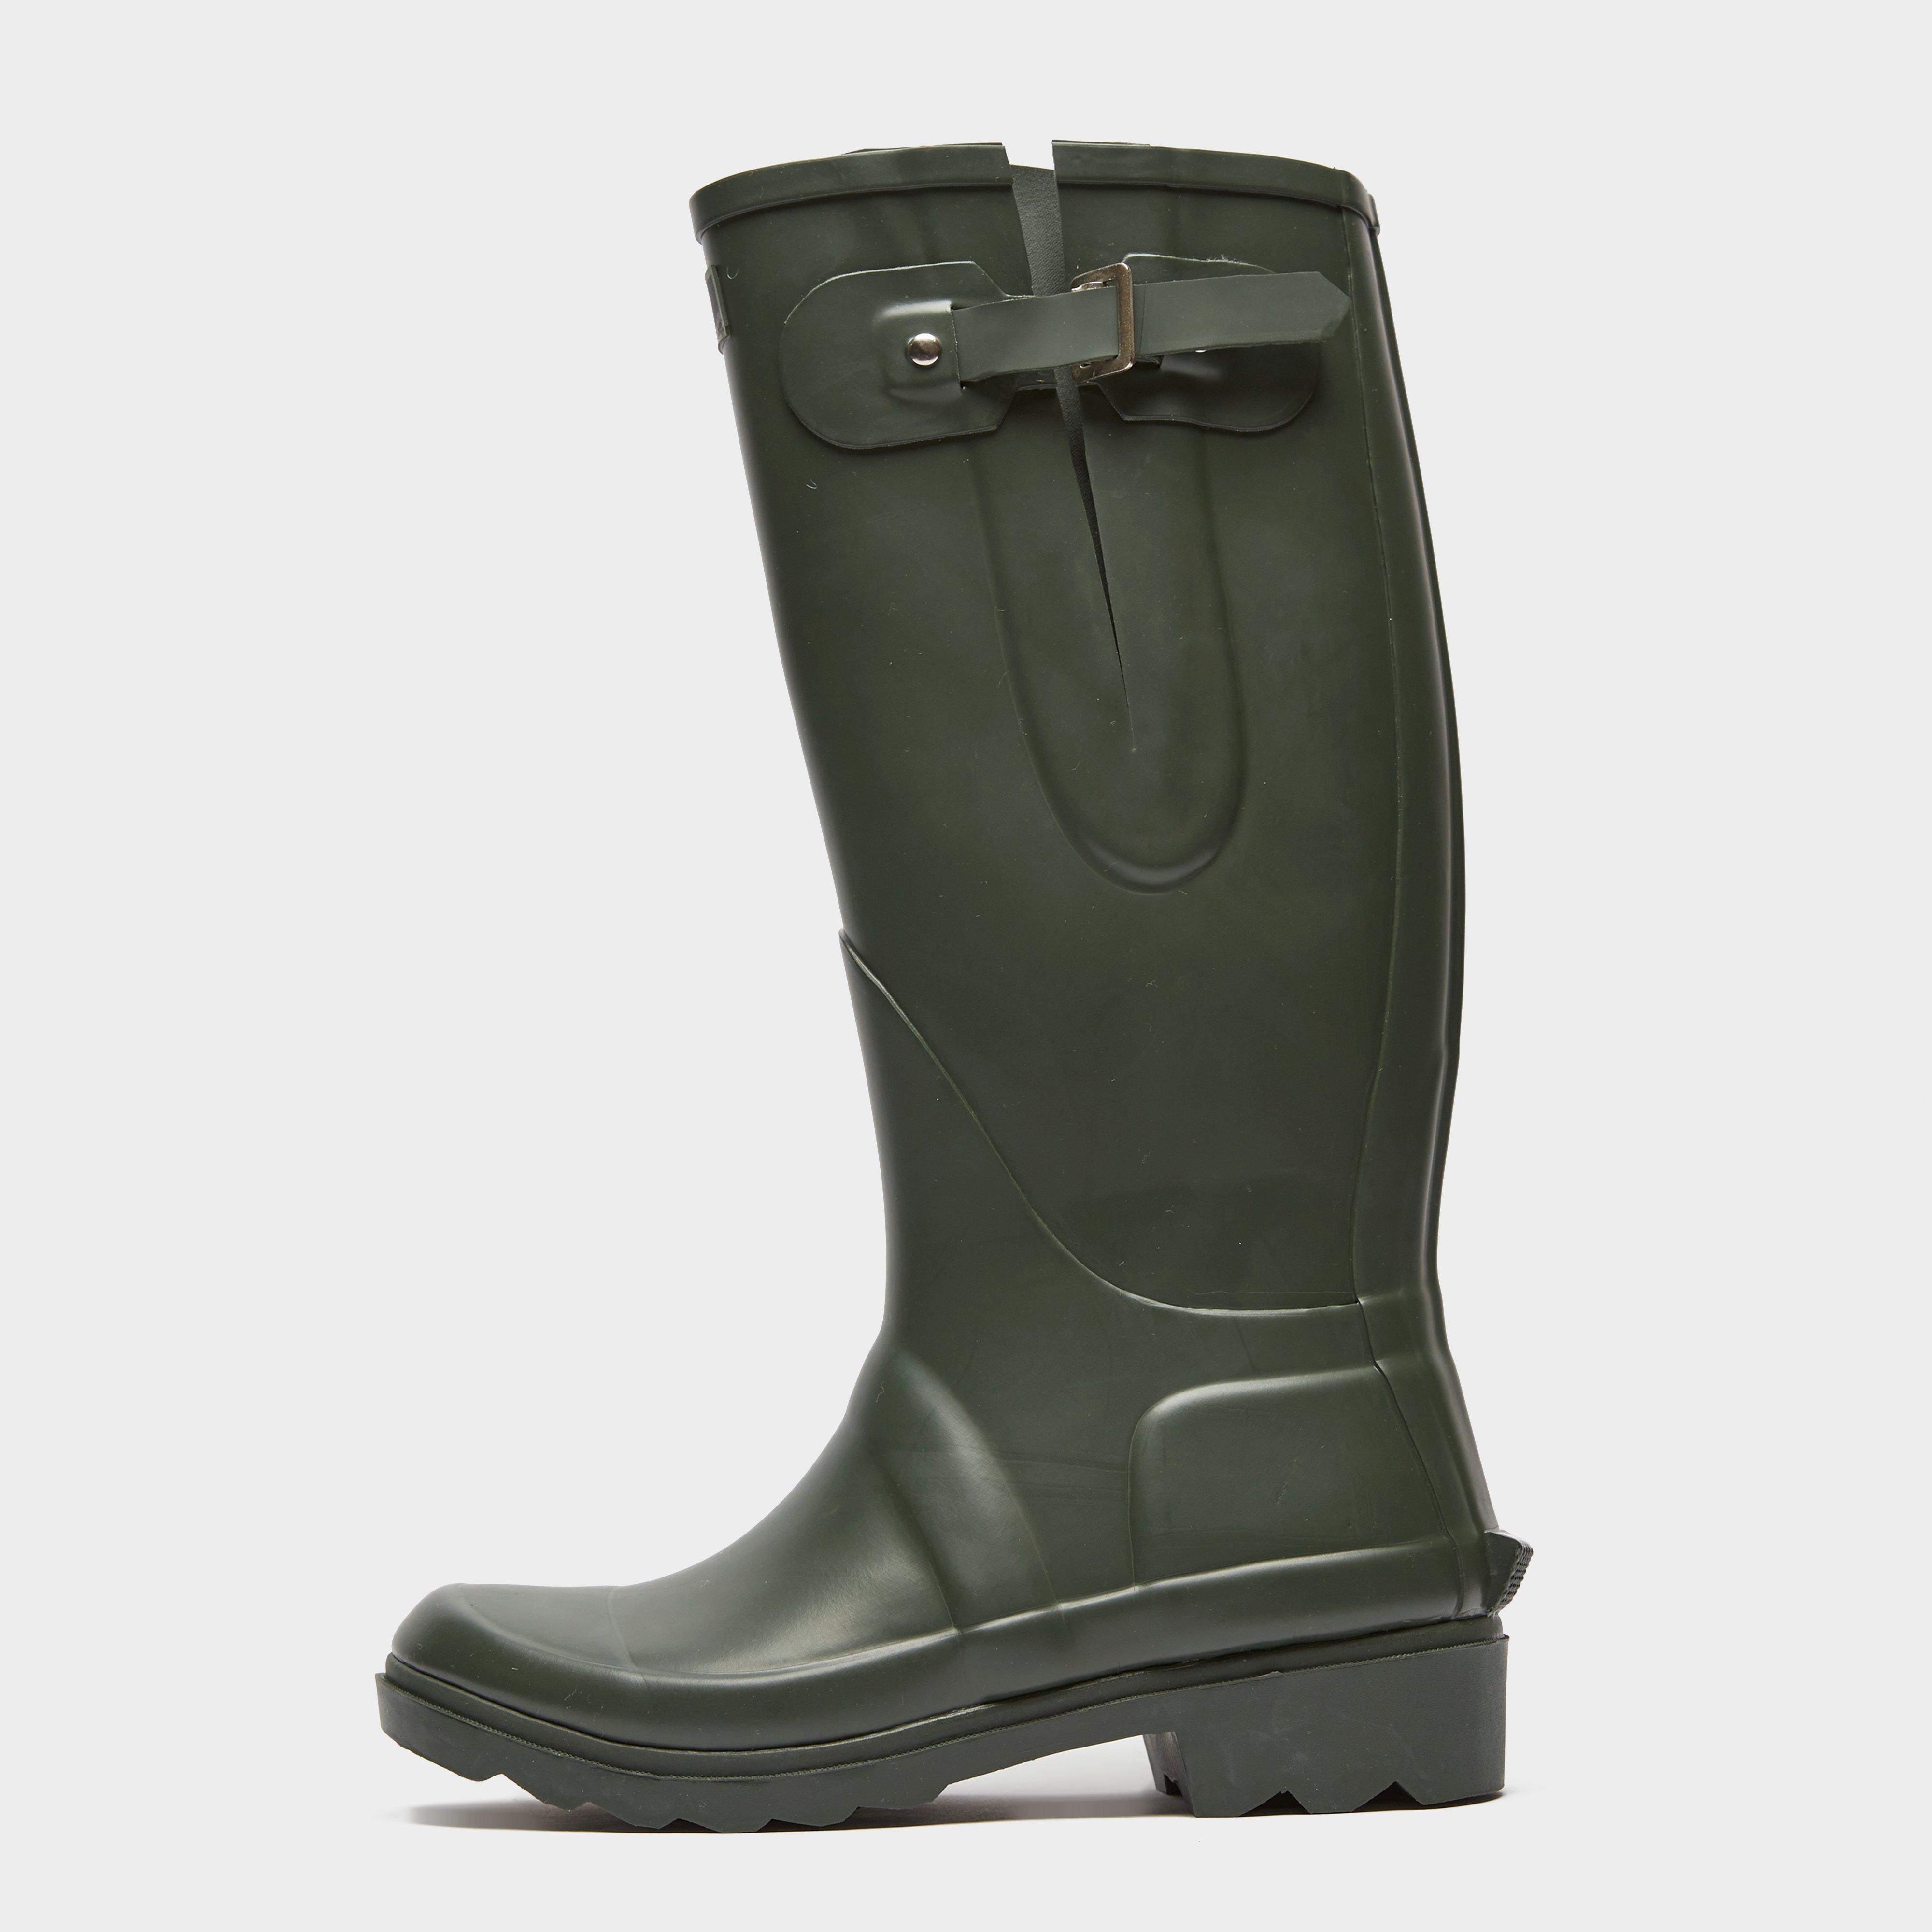 Cotswold Ragley Waterproof Wellington Boot - Green, Green